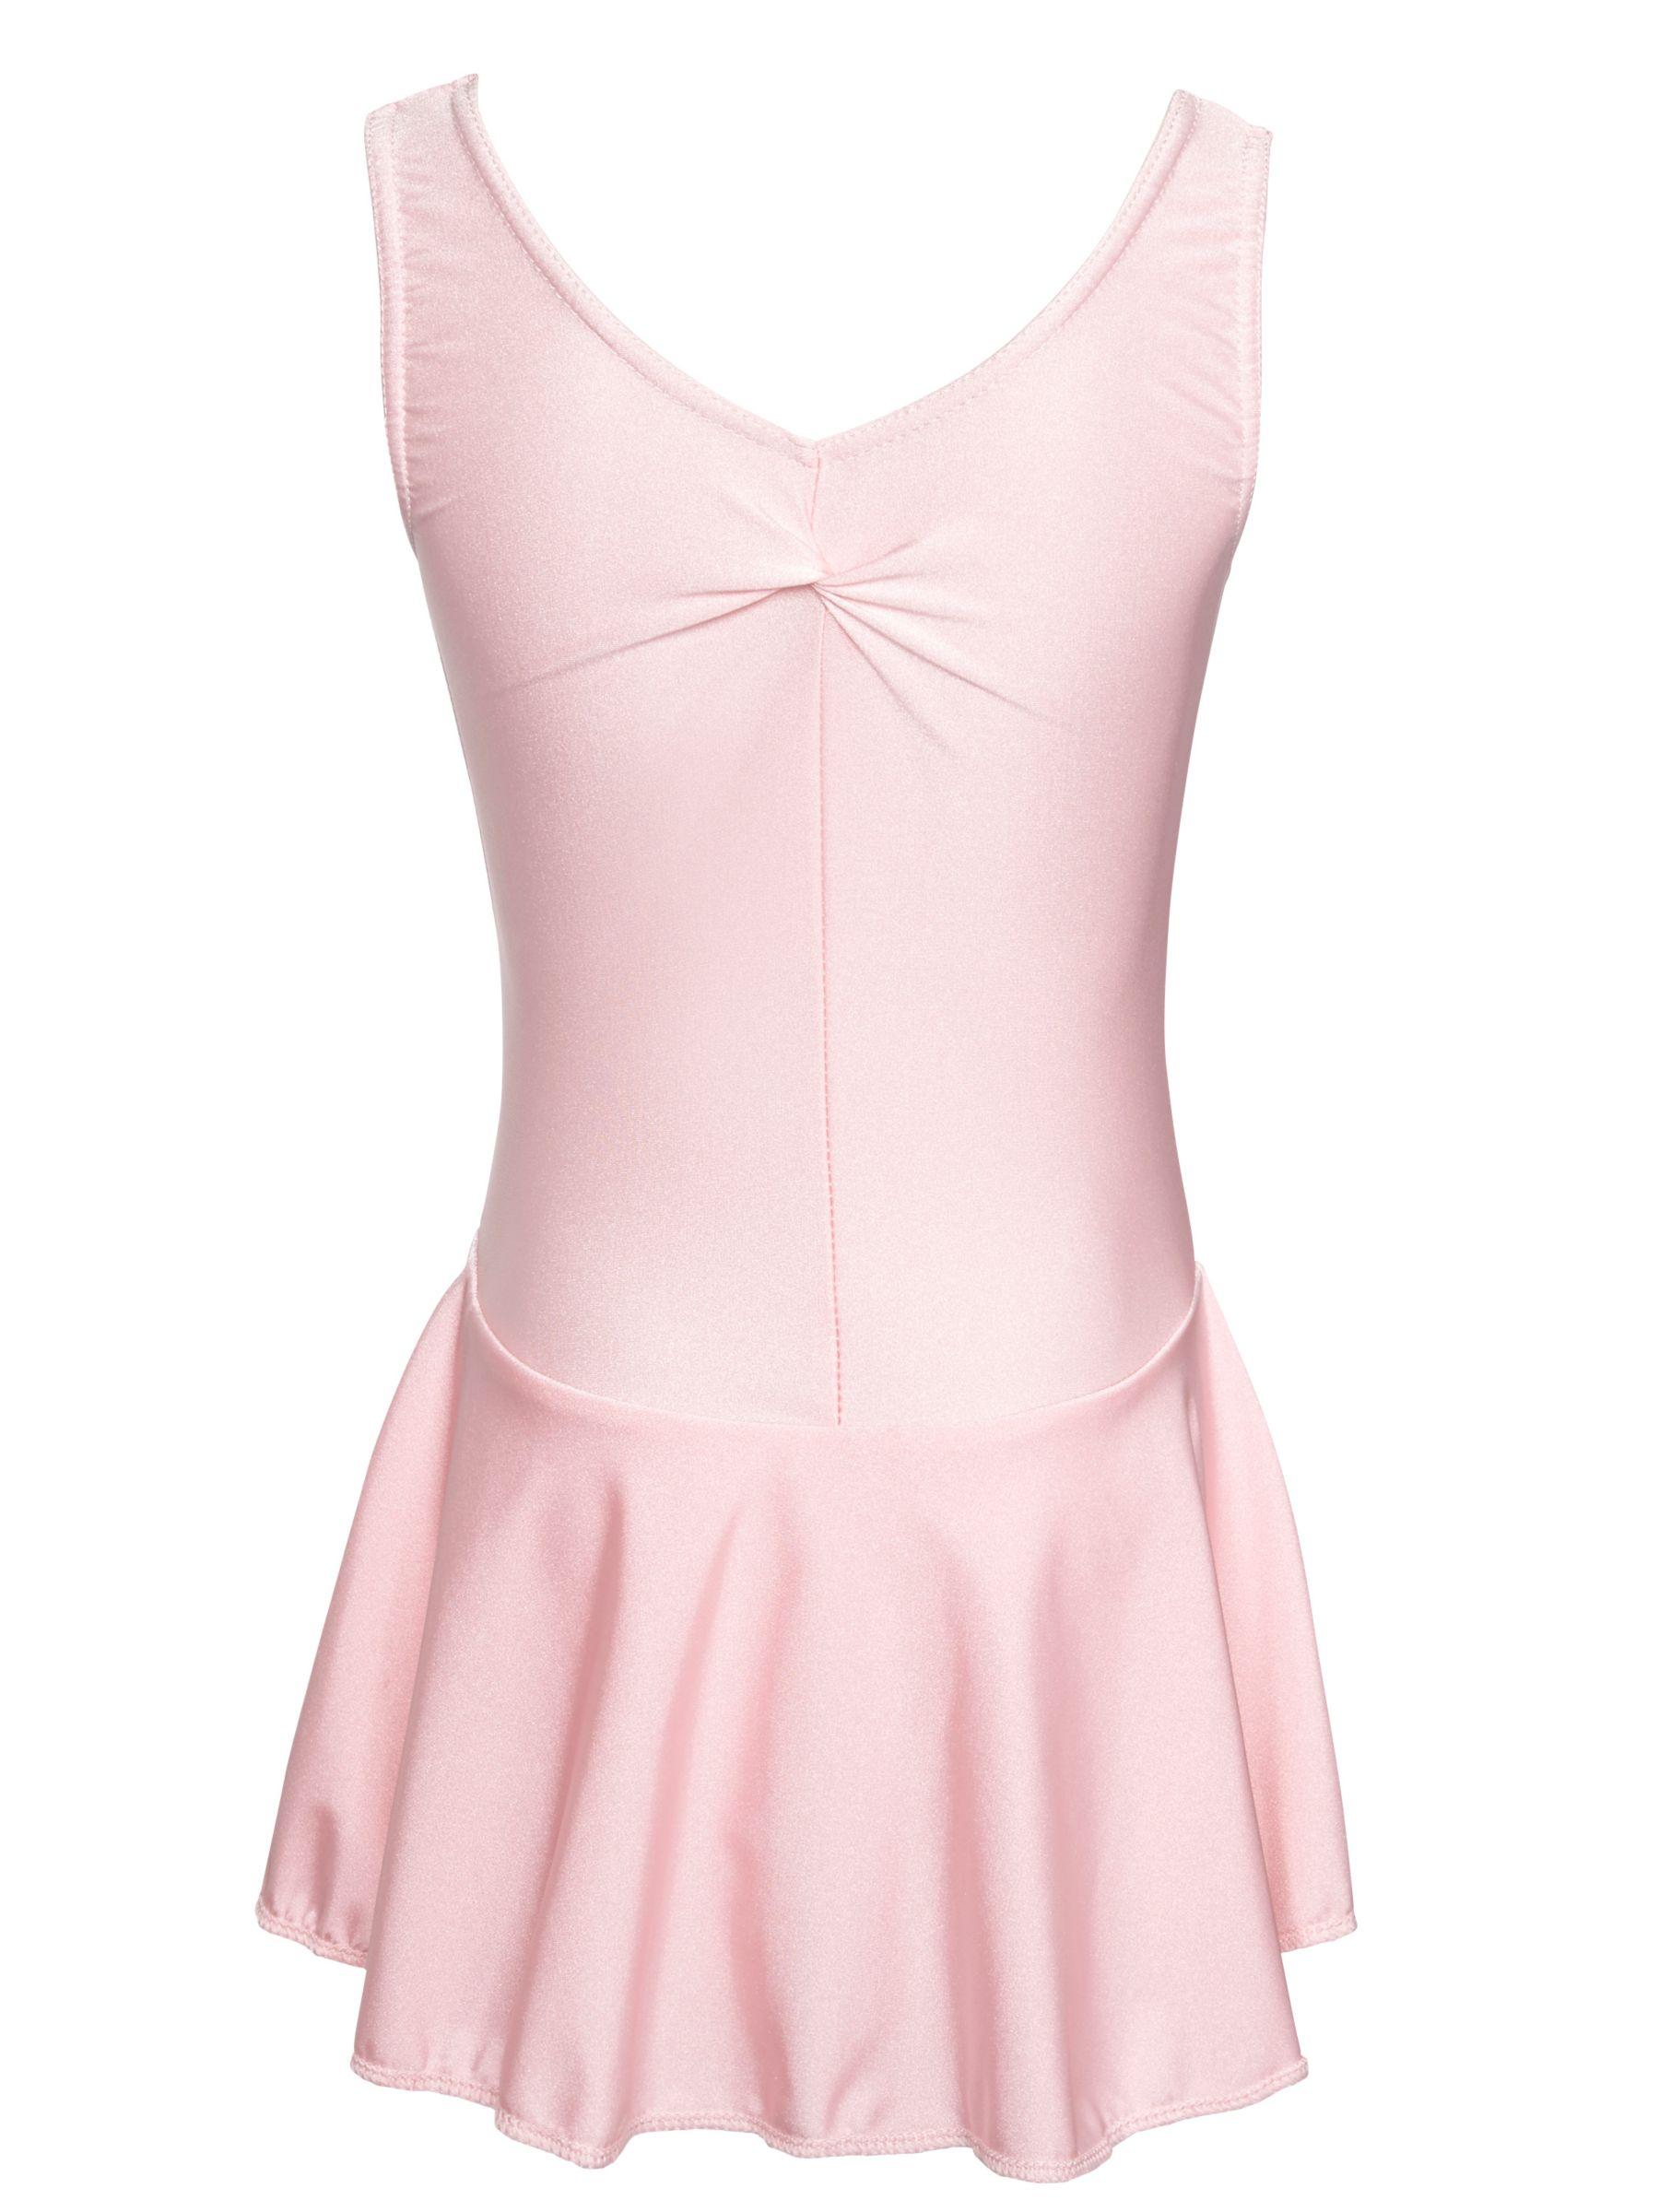 Freed Dancewear Freed Dancewear Jessy Skirt Leotard, Pink